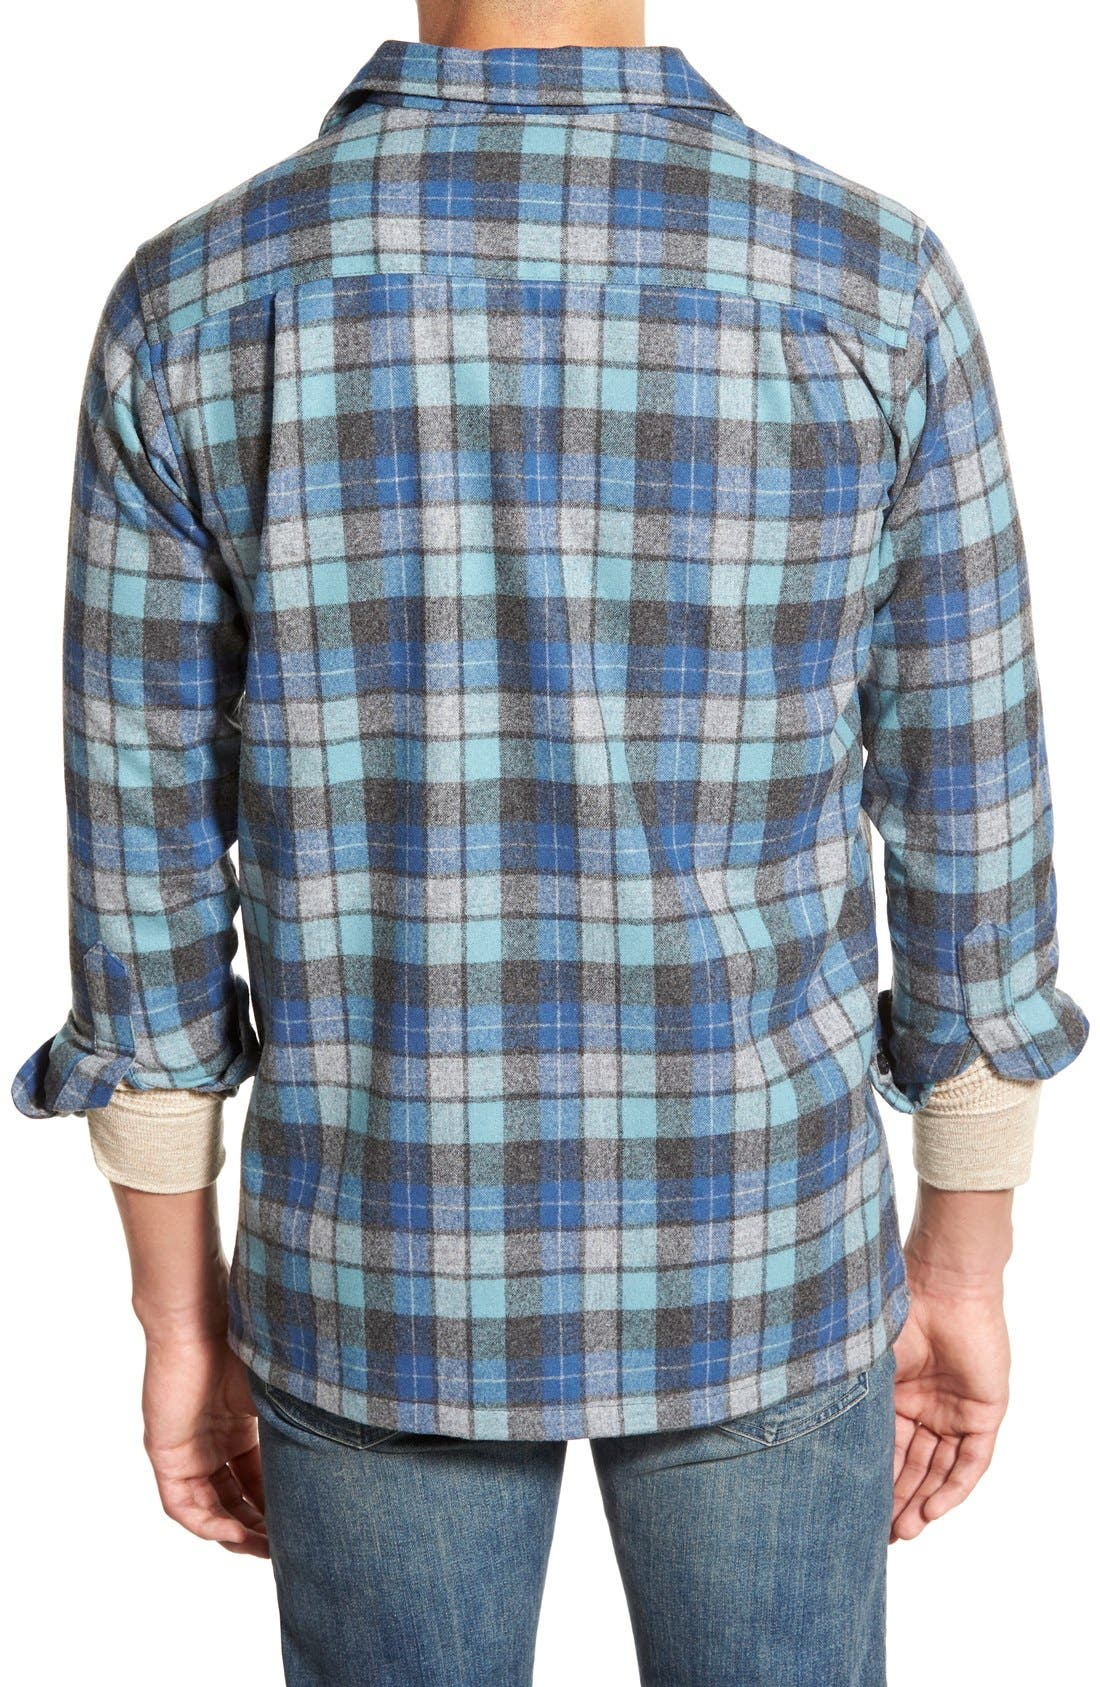 'Board' Regular Fit Flannel Shirt,                             Alternate thumbnail 2, color,                             Blue Original Surf Plaid